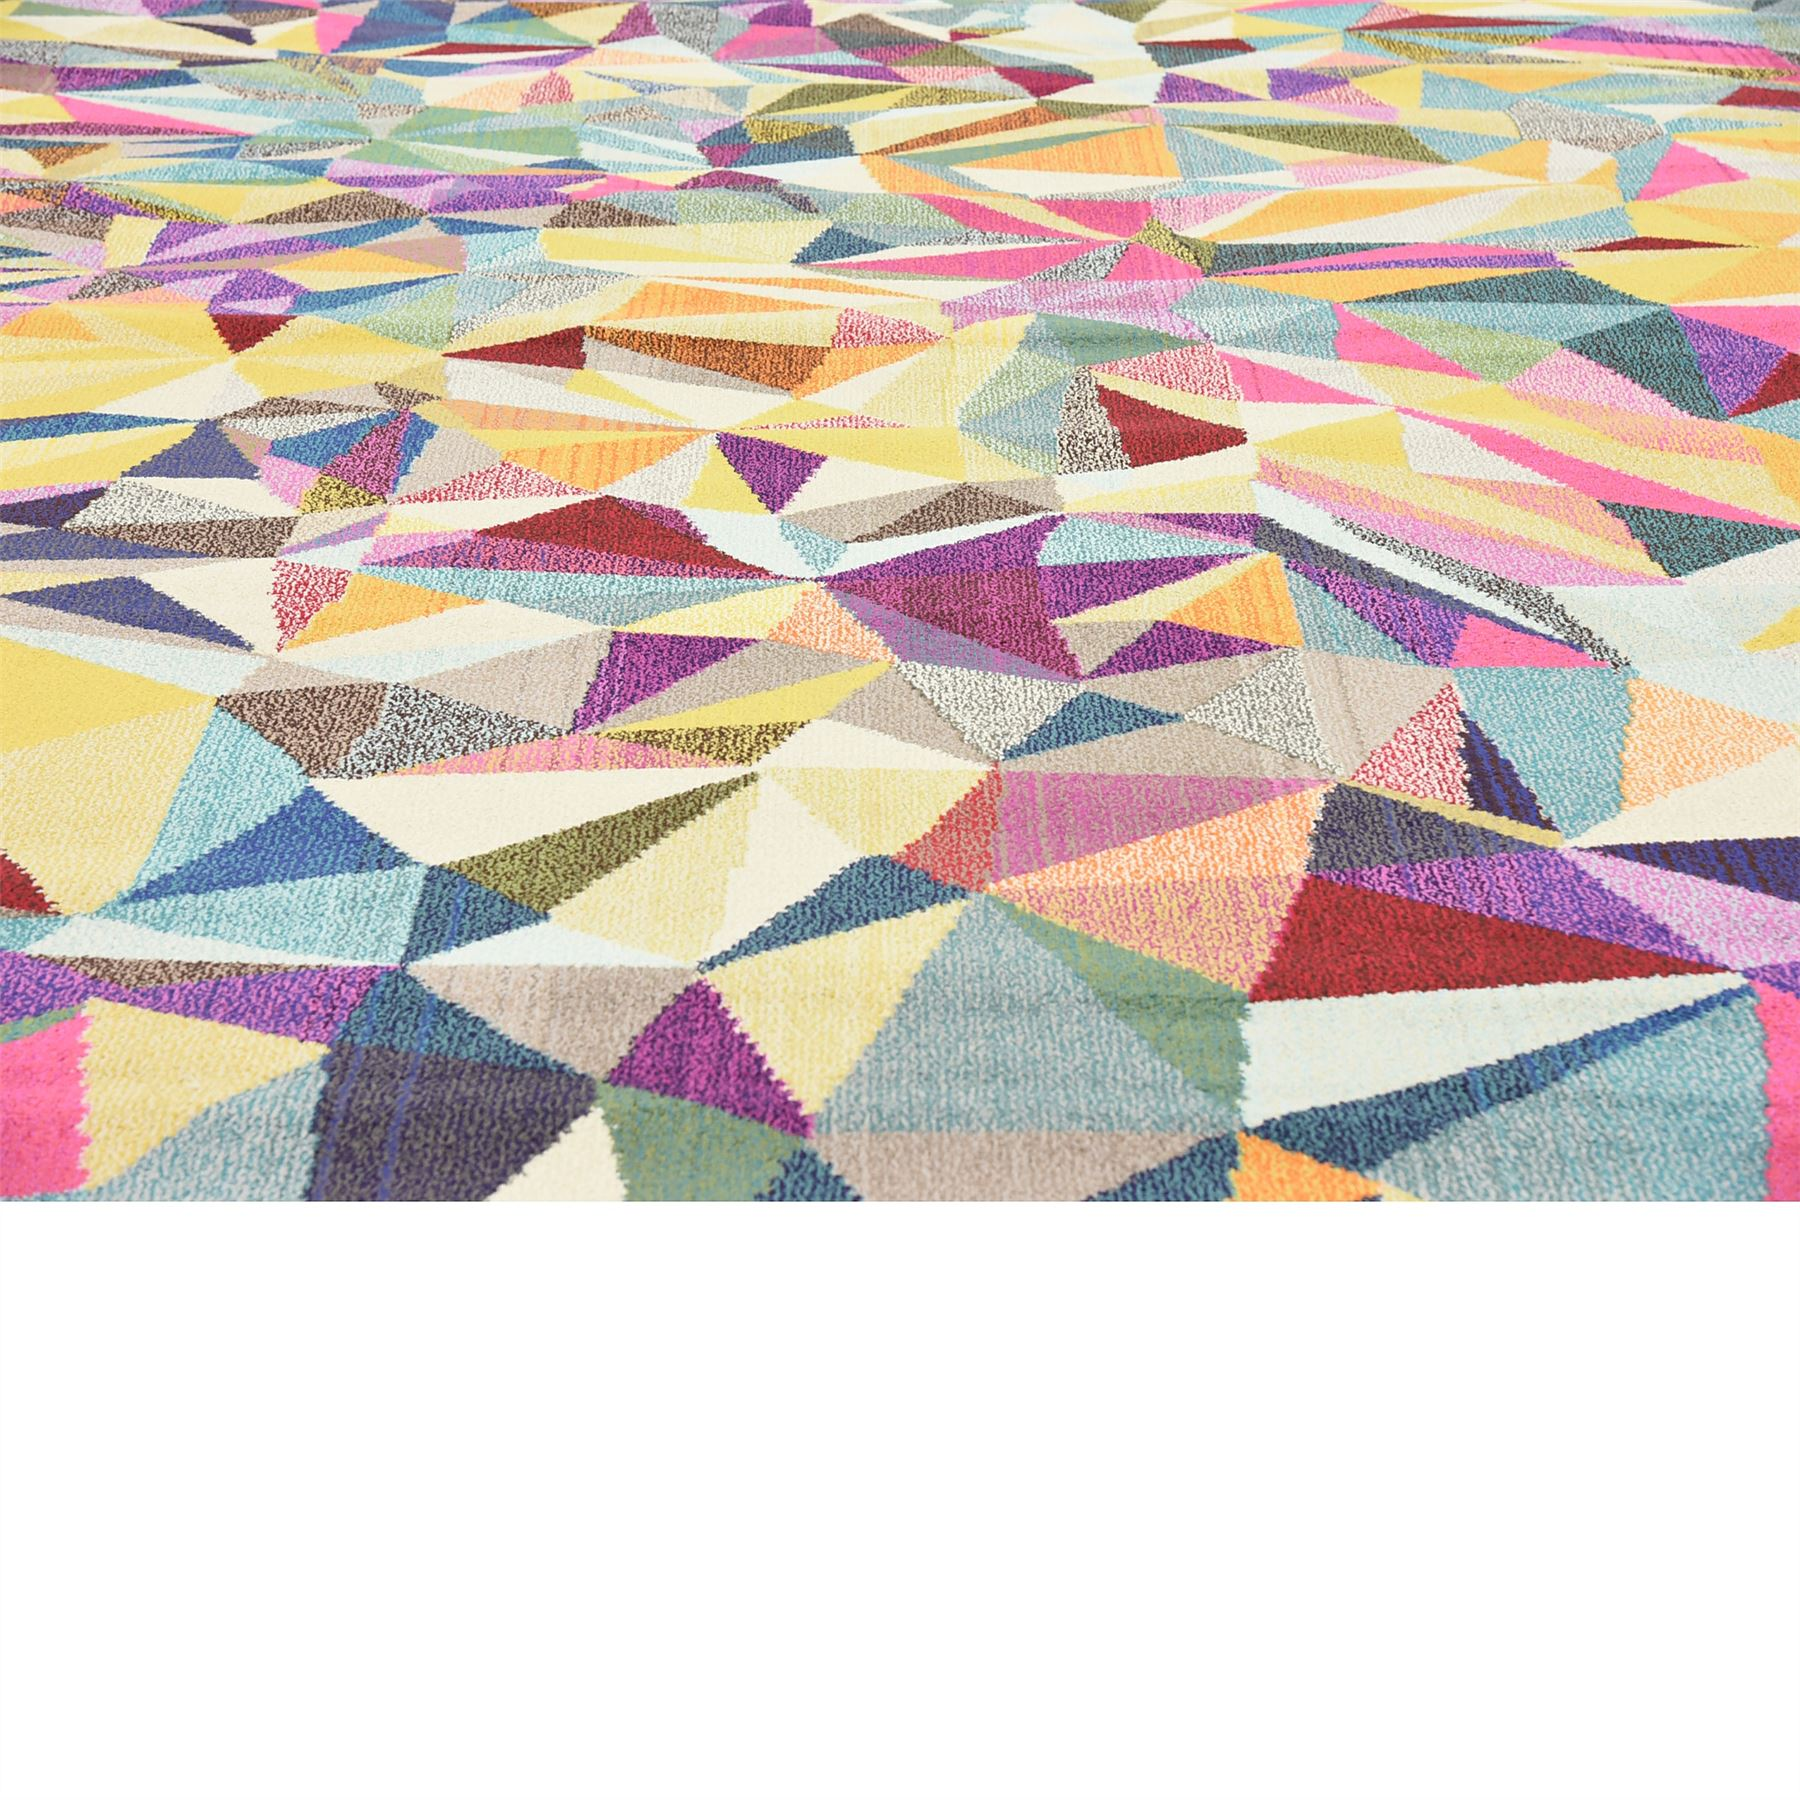 Minimalist Colorful Rug Designs: Multi Color Modern Design Area Rug Contemporary Style